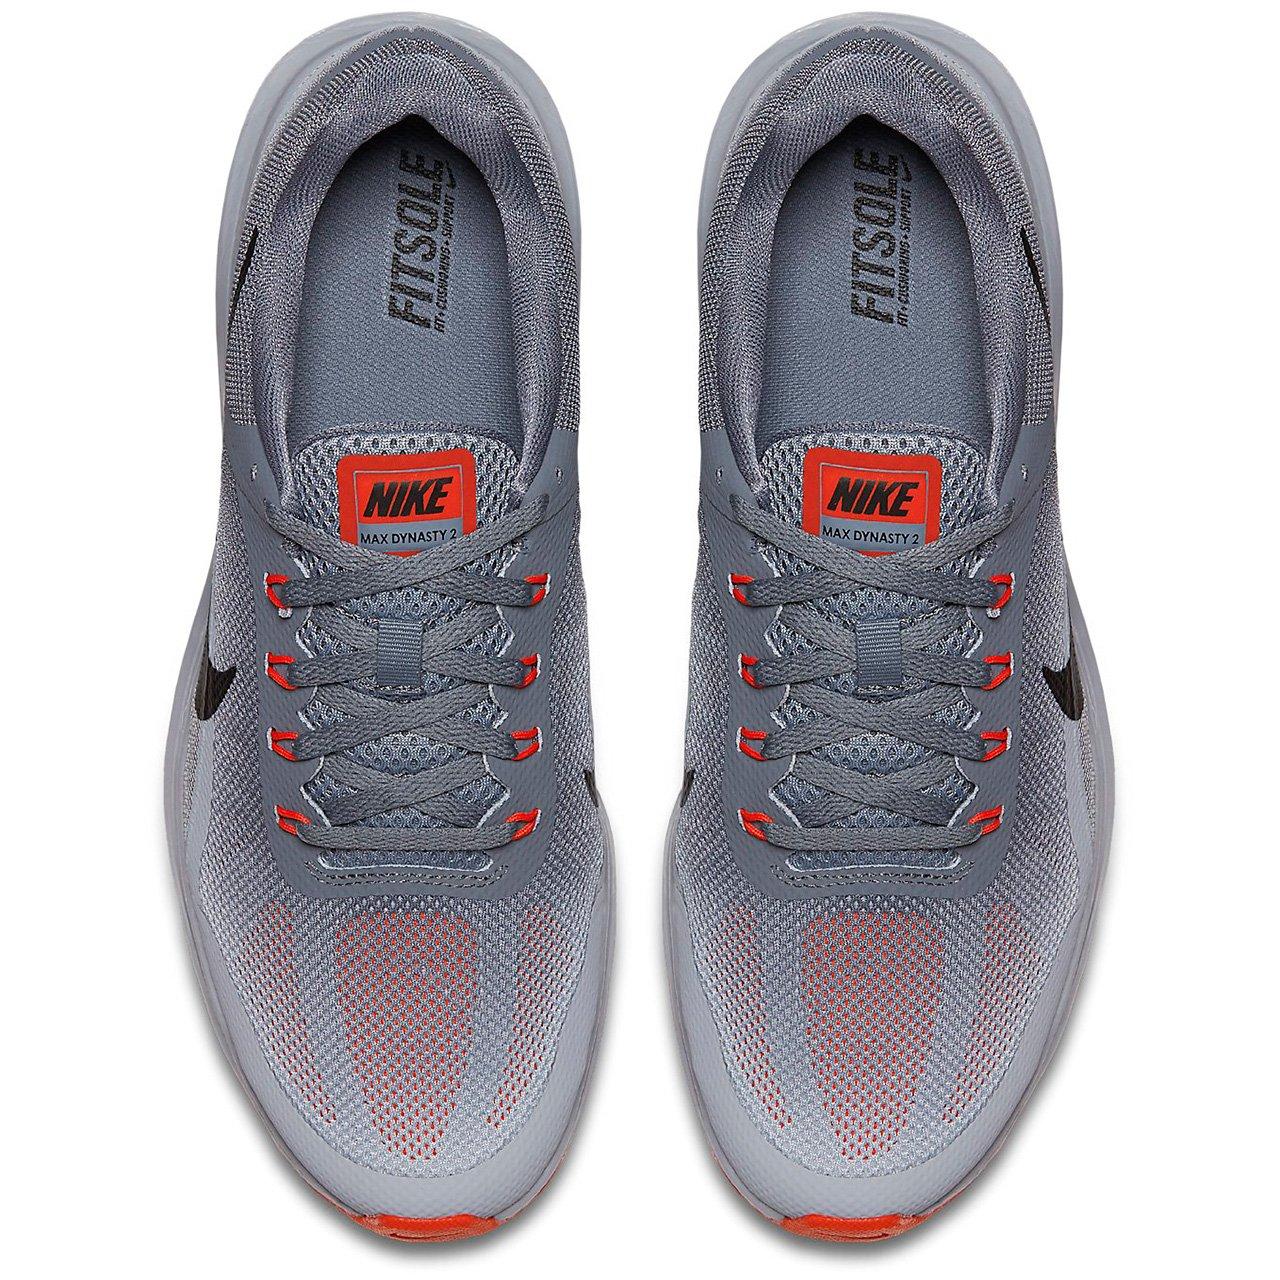 Nike Damen Kapuzenpullover Limitless Limitless Limitless Exploded Hoody 080841